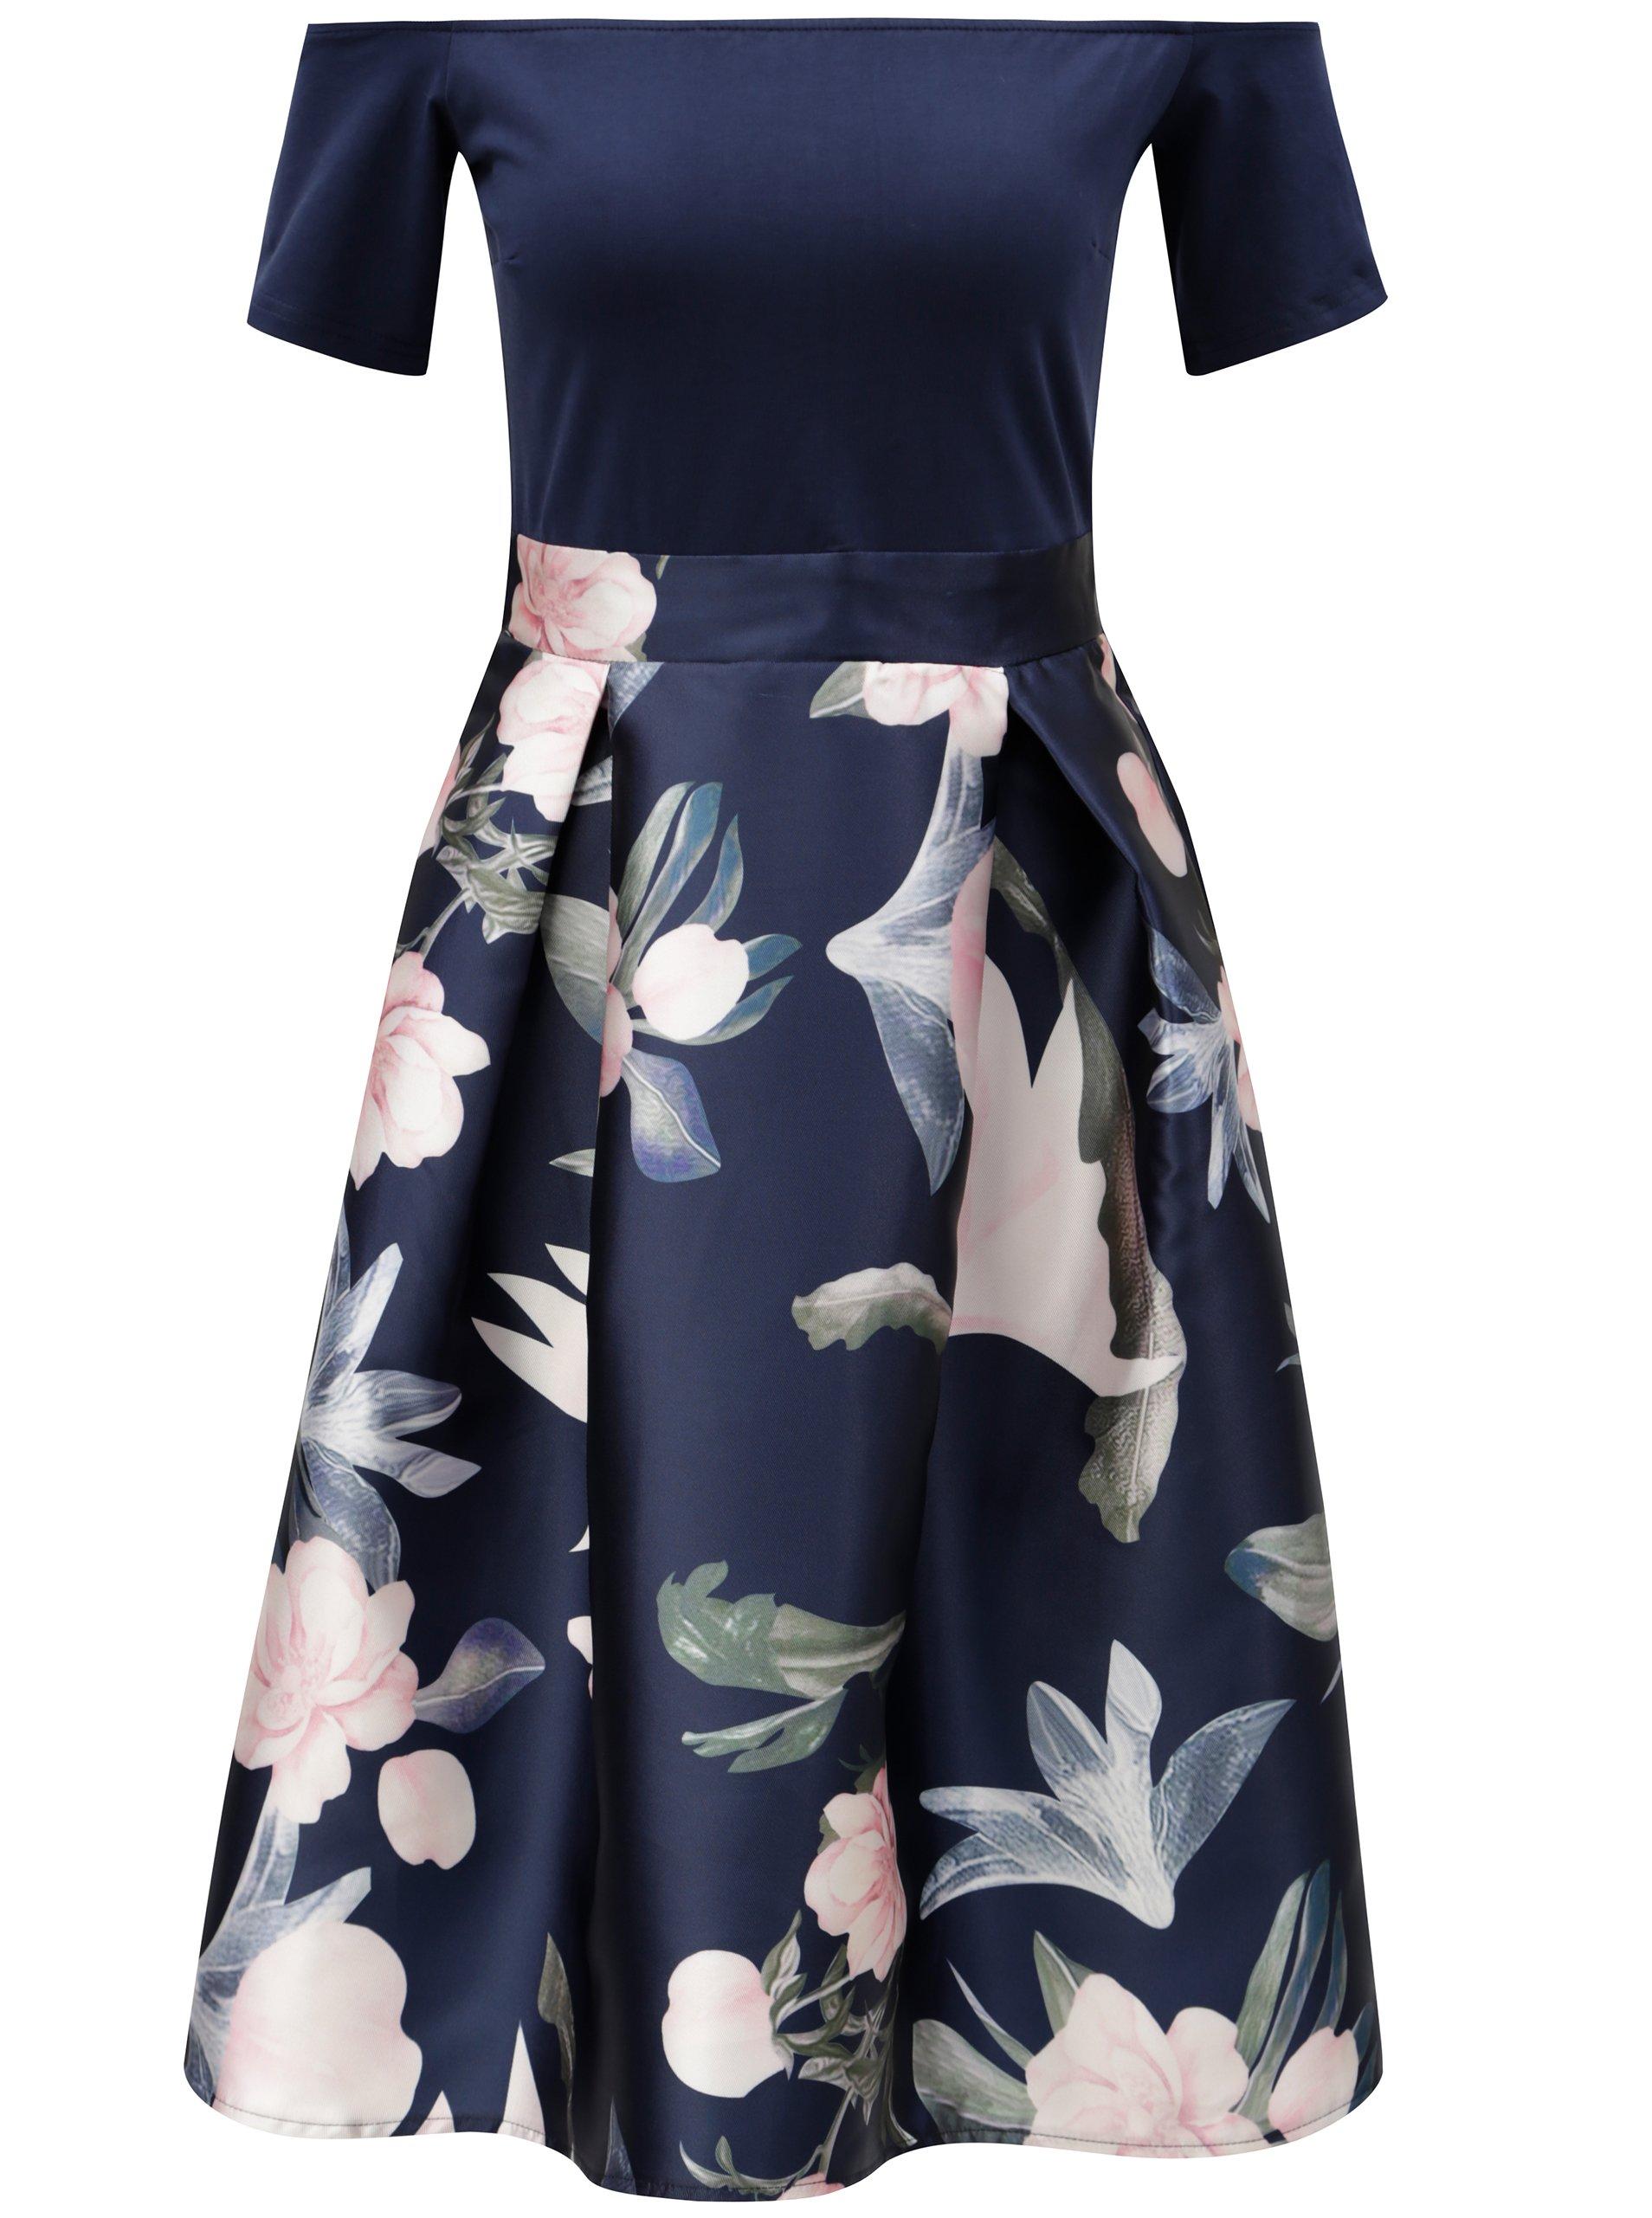 ab4659b5d0e0 Tmavomodré šaty s kvetovanou sukňou AX Paris